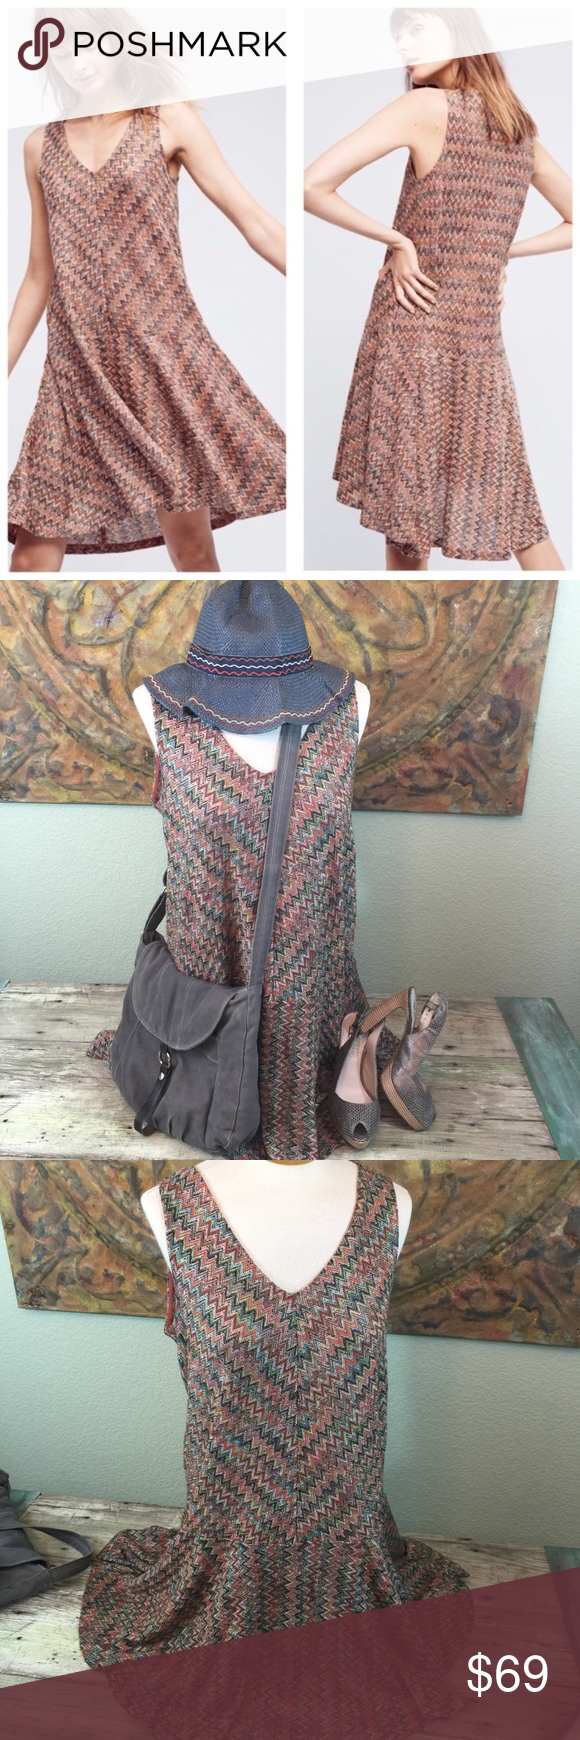 17c9fd91ff0f Maeve Anthropologie Westwater chevron drop waist Anthropologie brand Maeve  dress, chevron knit with a drop